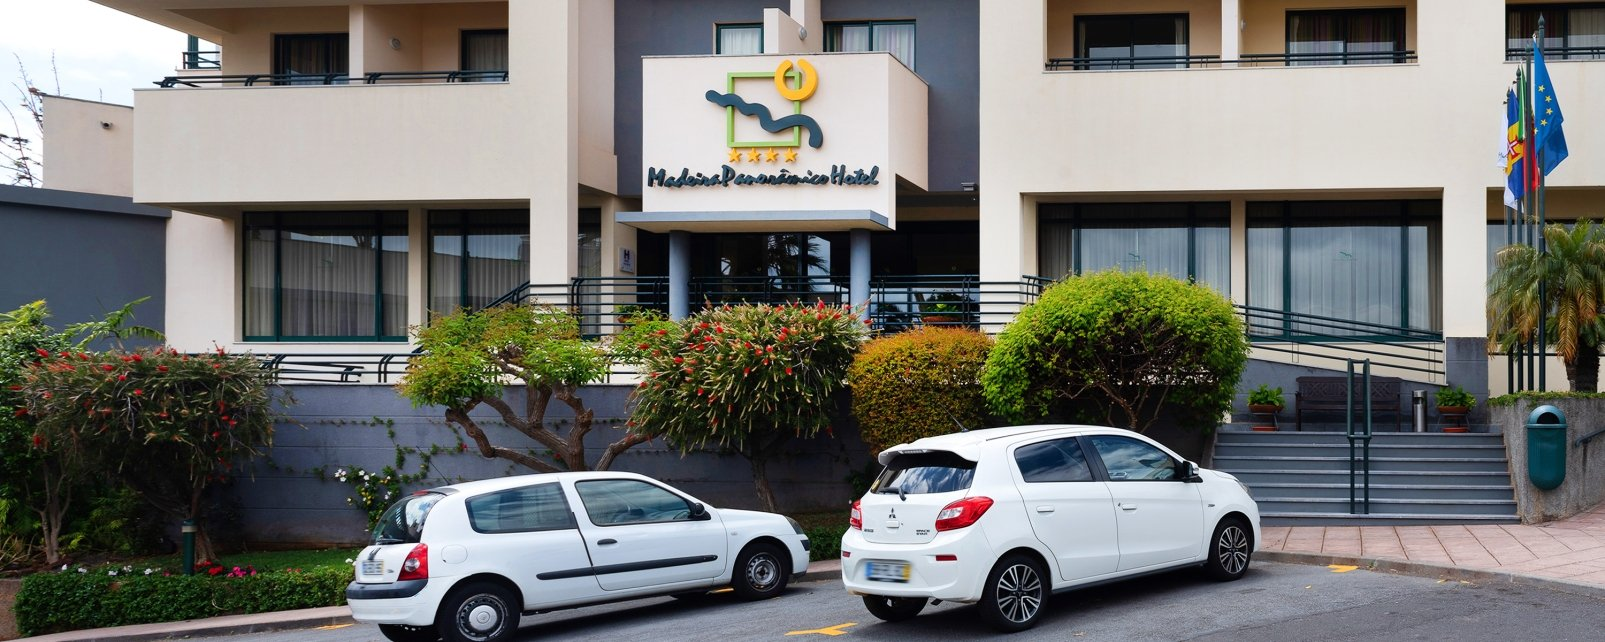 Hotel Madeira Panorâmico